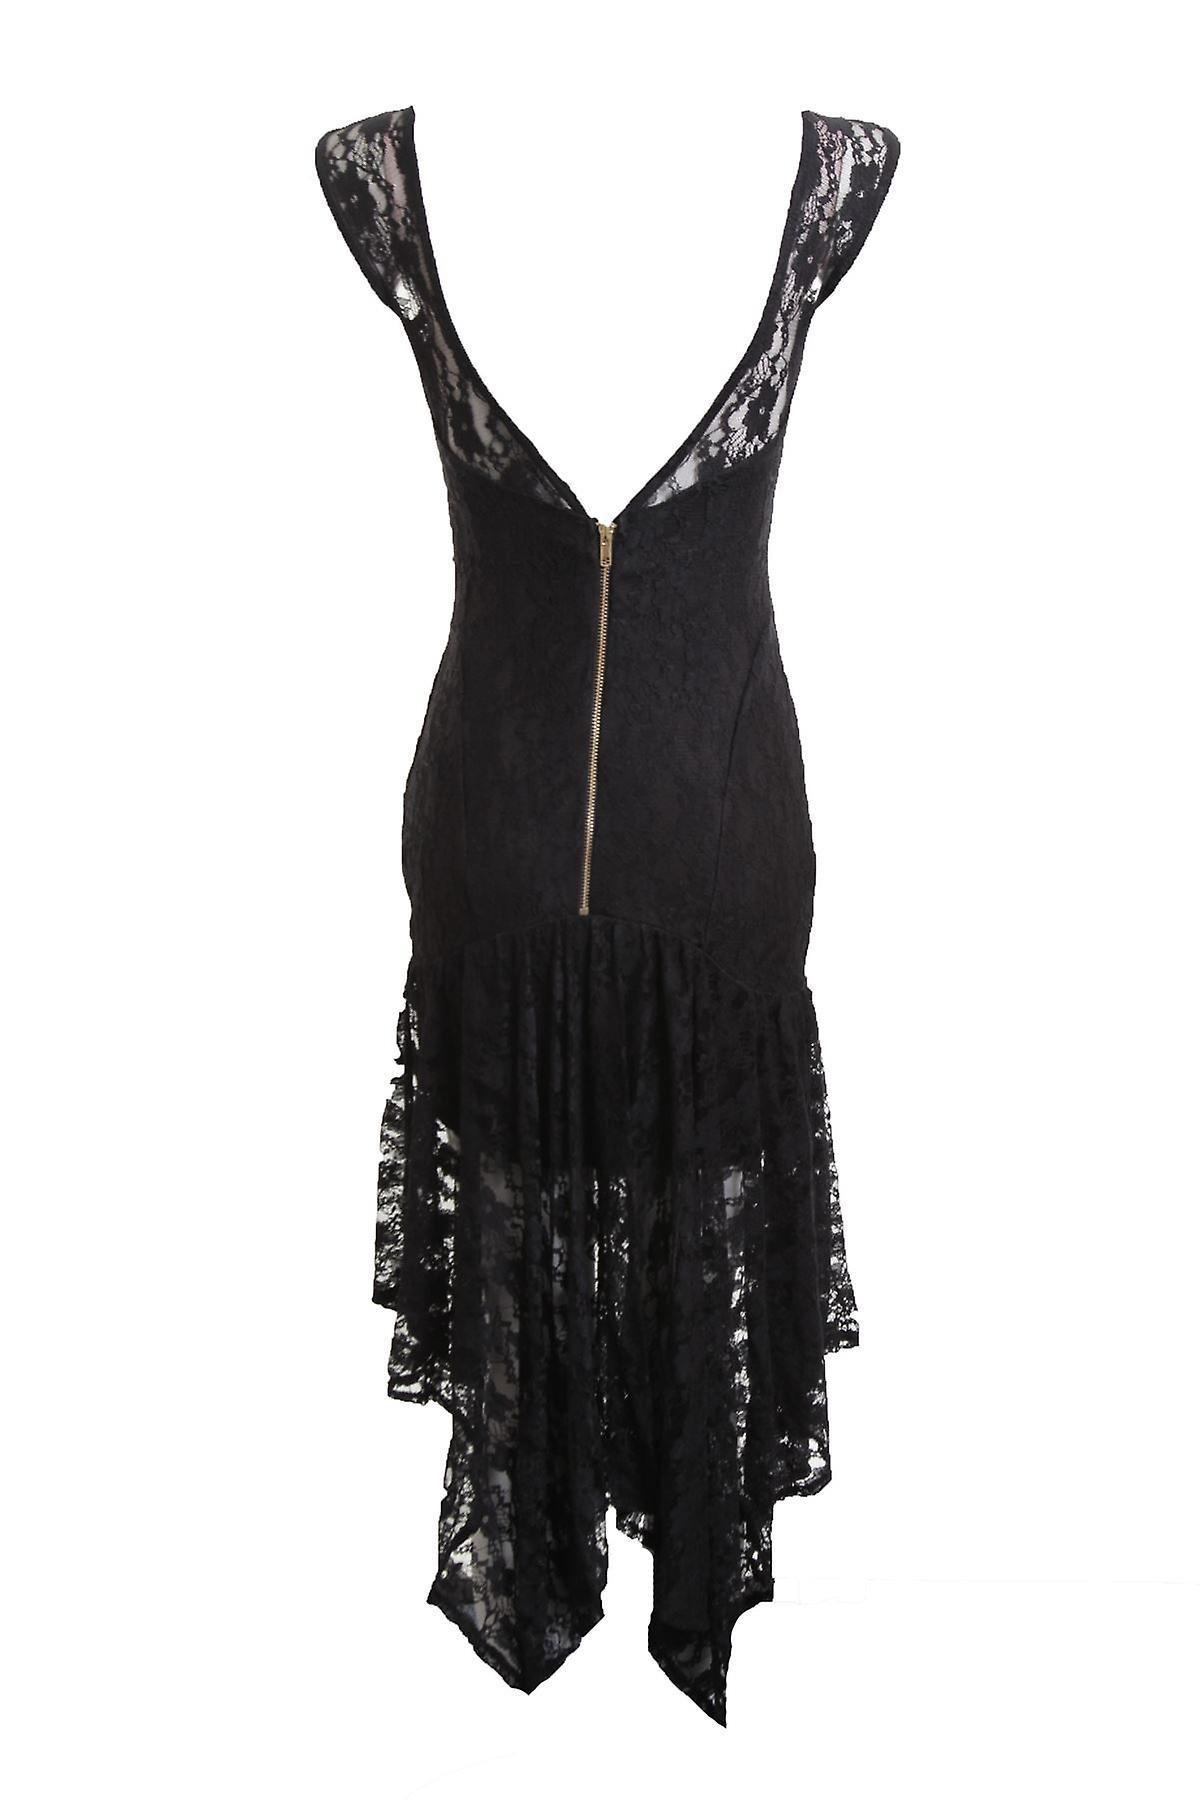 New Ladies Sleeveless V Zip Back High Low Black Lace Women's Dress